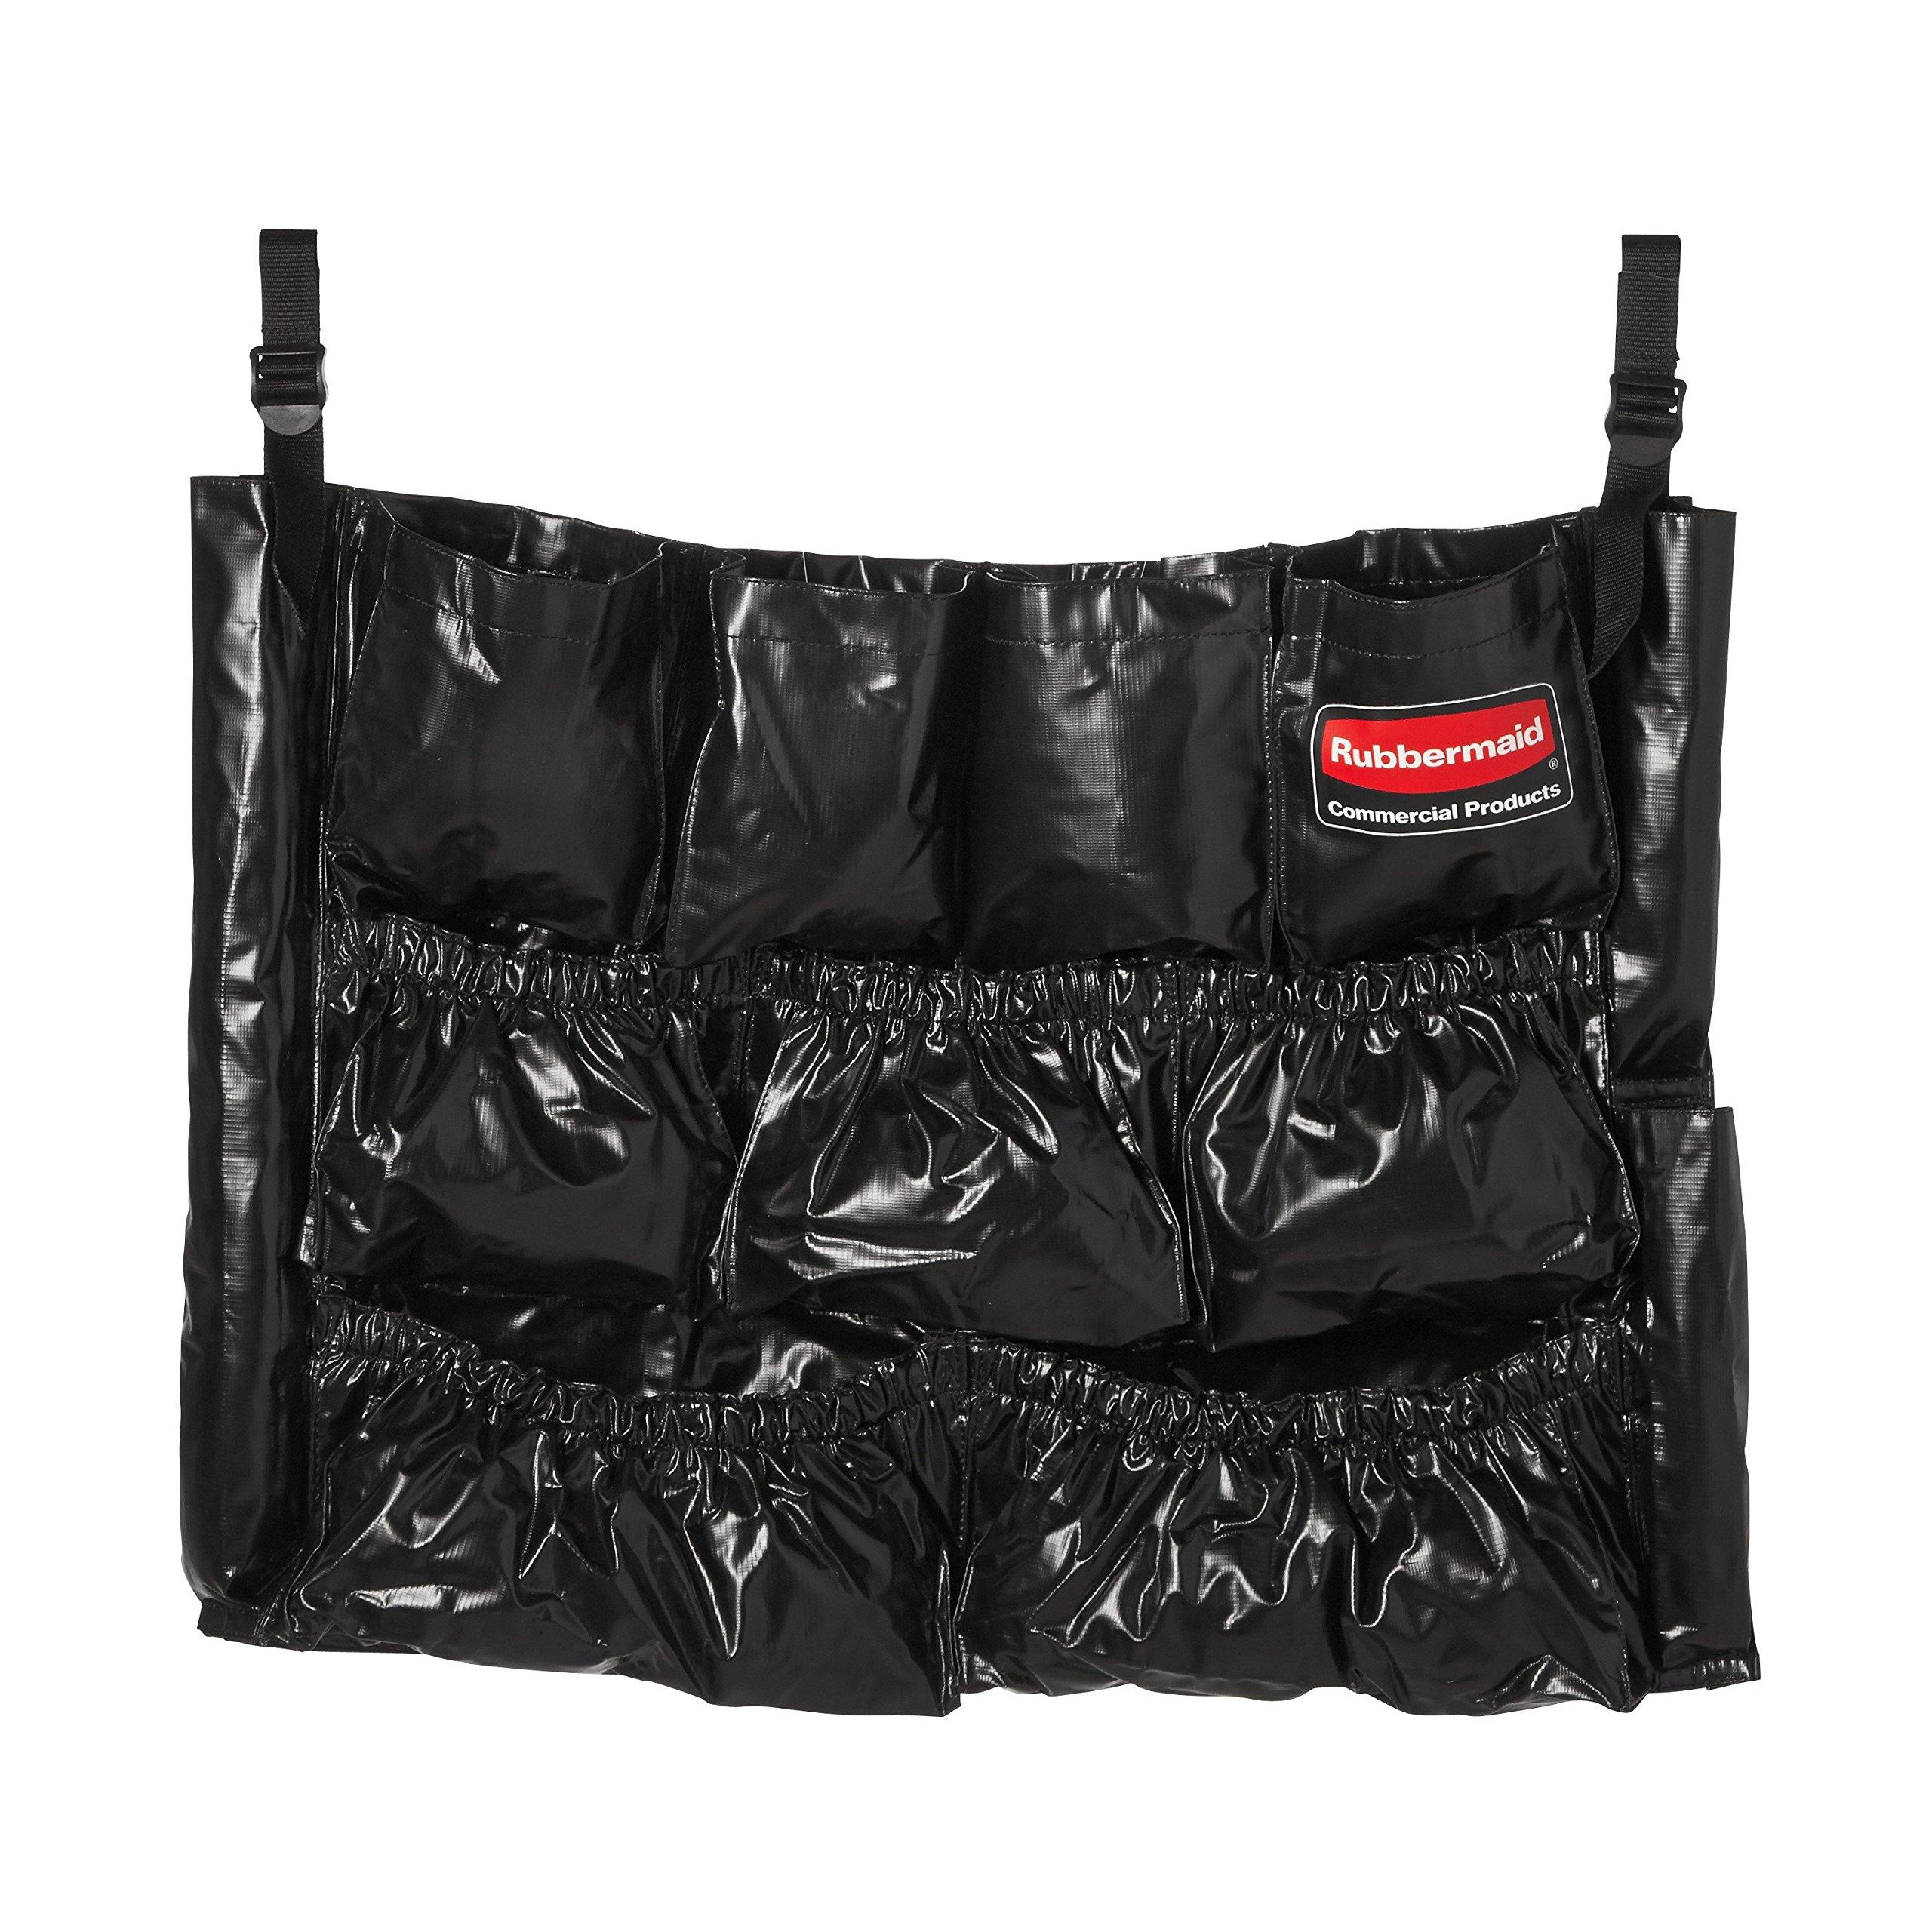 Buy Rubbermaid Designer Series Shower Caddy Extra Deep Shelves Bath ...